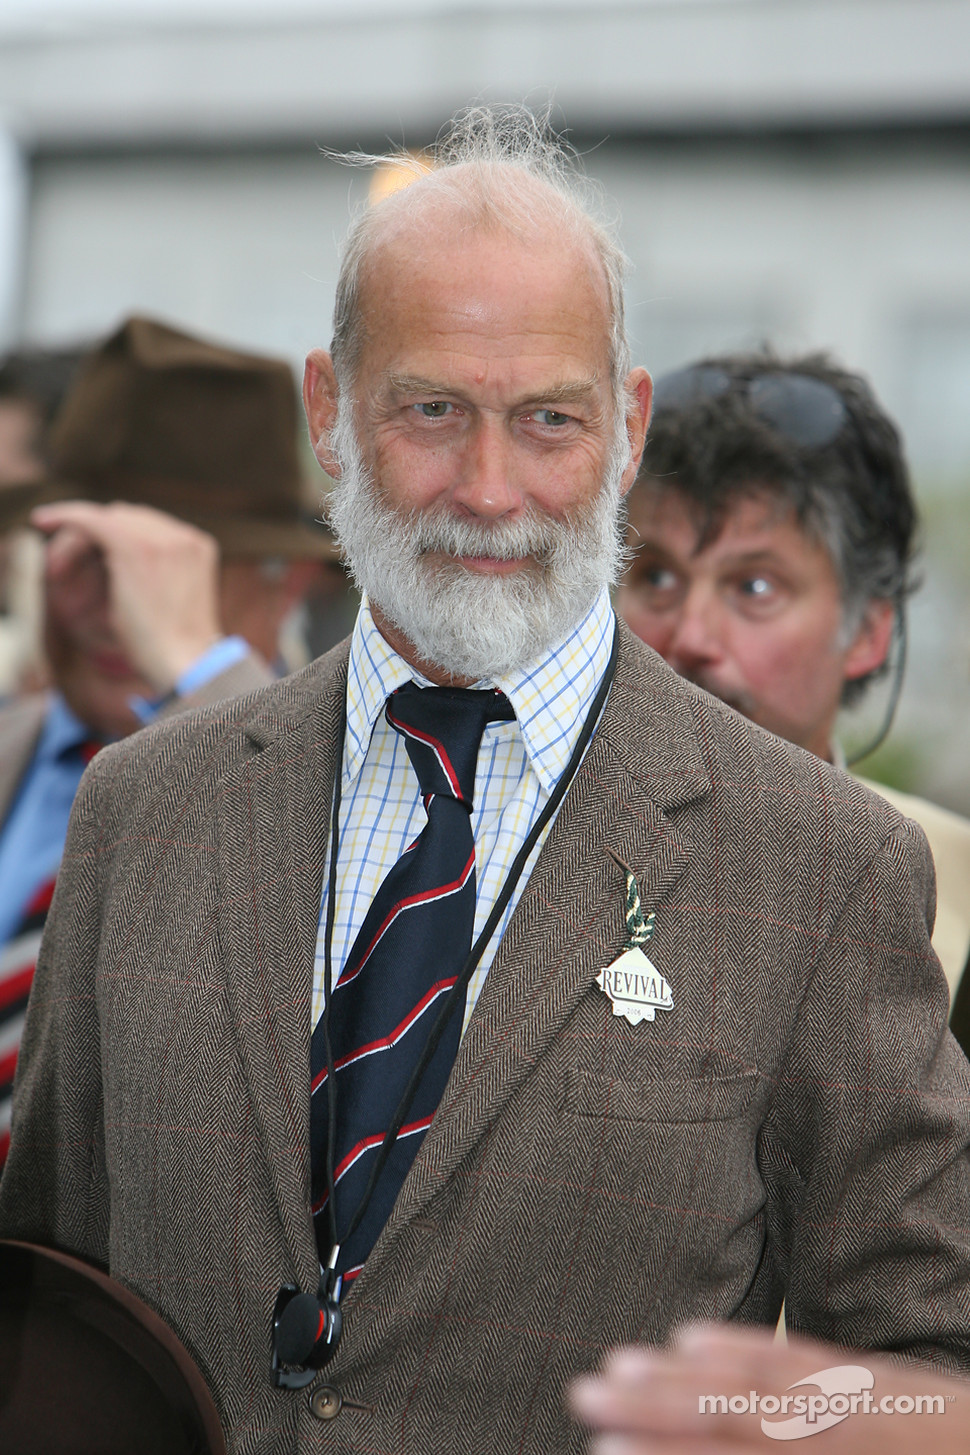 Stylish members of the British Royal Family